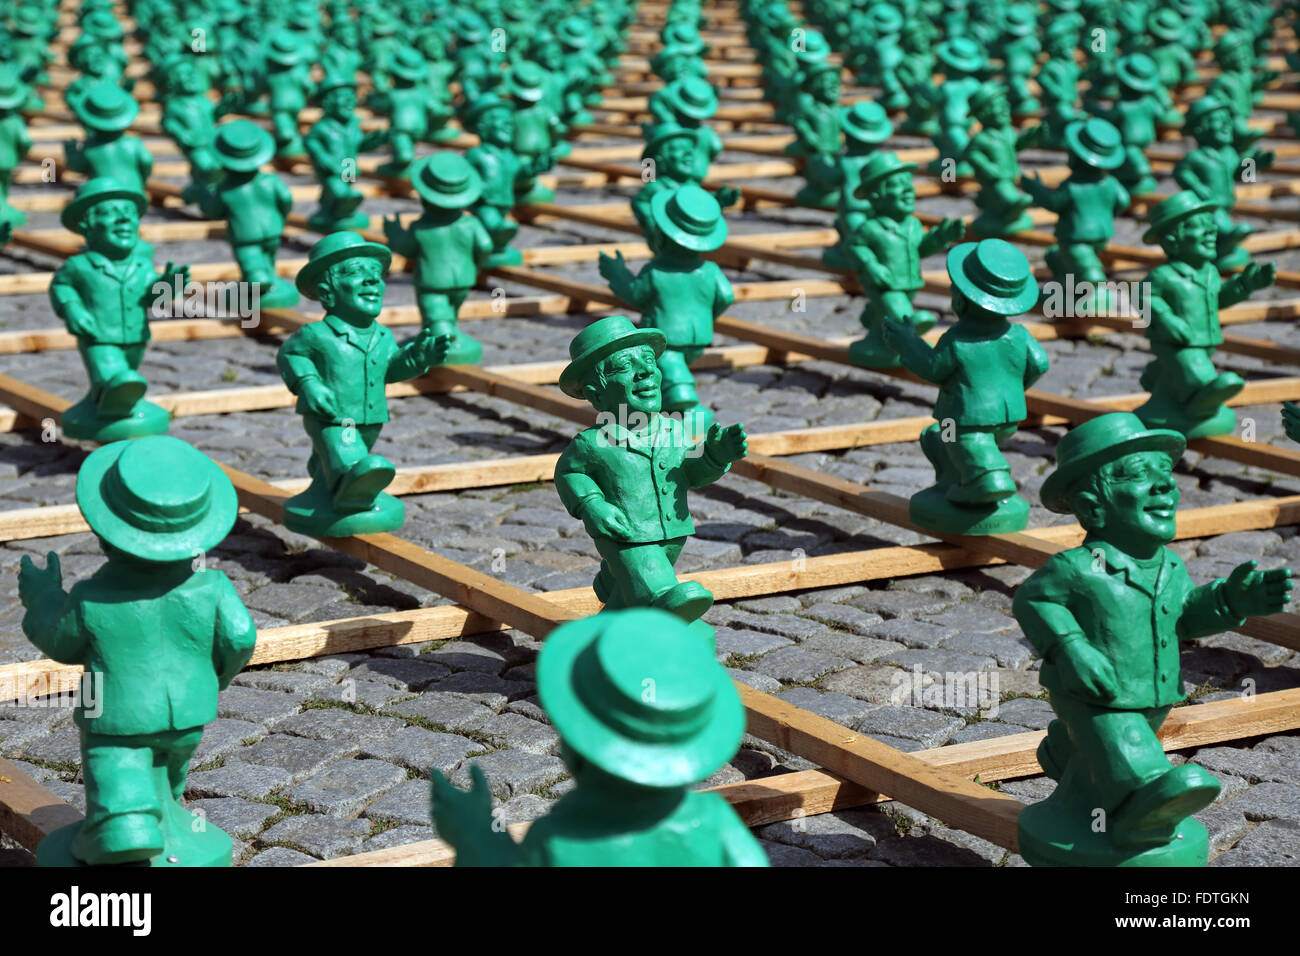 Schwerin, Germany, art project boundaries overcome Ottmar Hoerl - Stock Image